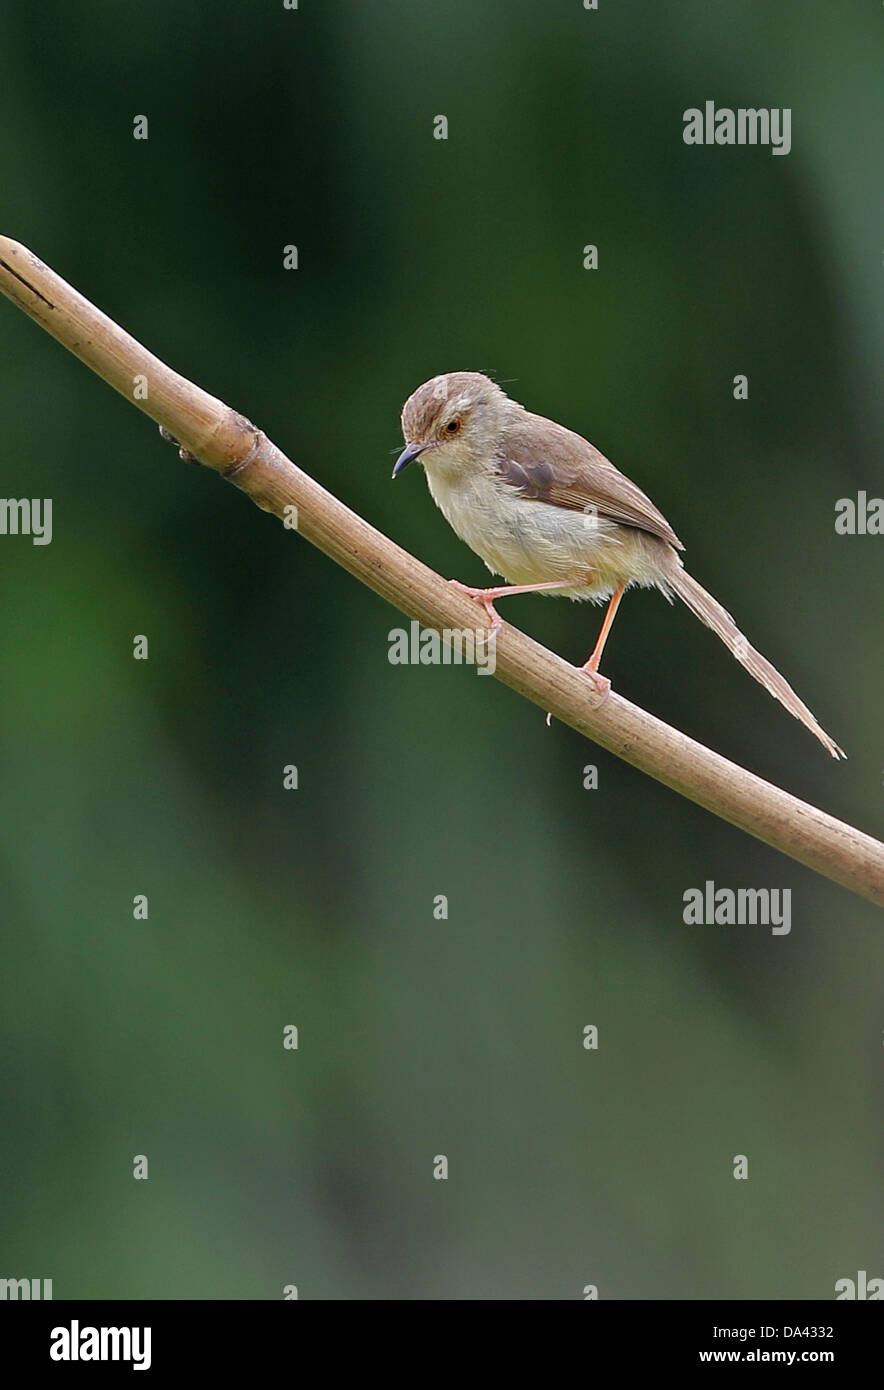 Plain Prinia (Prinia inornata flavirostris) adult, perched on stem, Taiwan, April Stock Photo